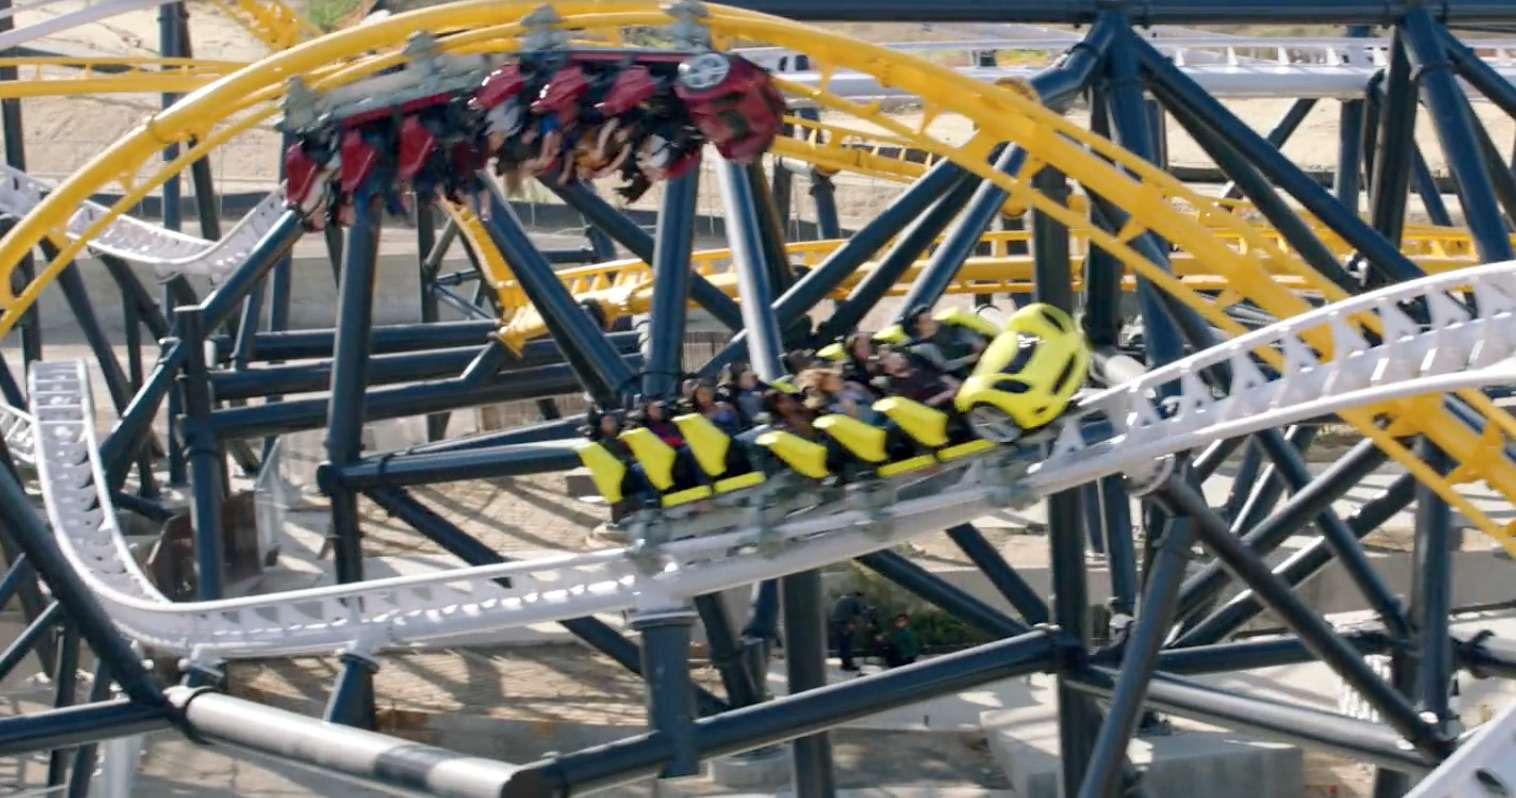 West Coast Racers montaña rusa en Six Flags Magic Mountain